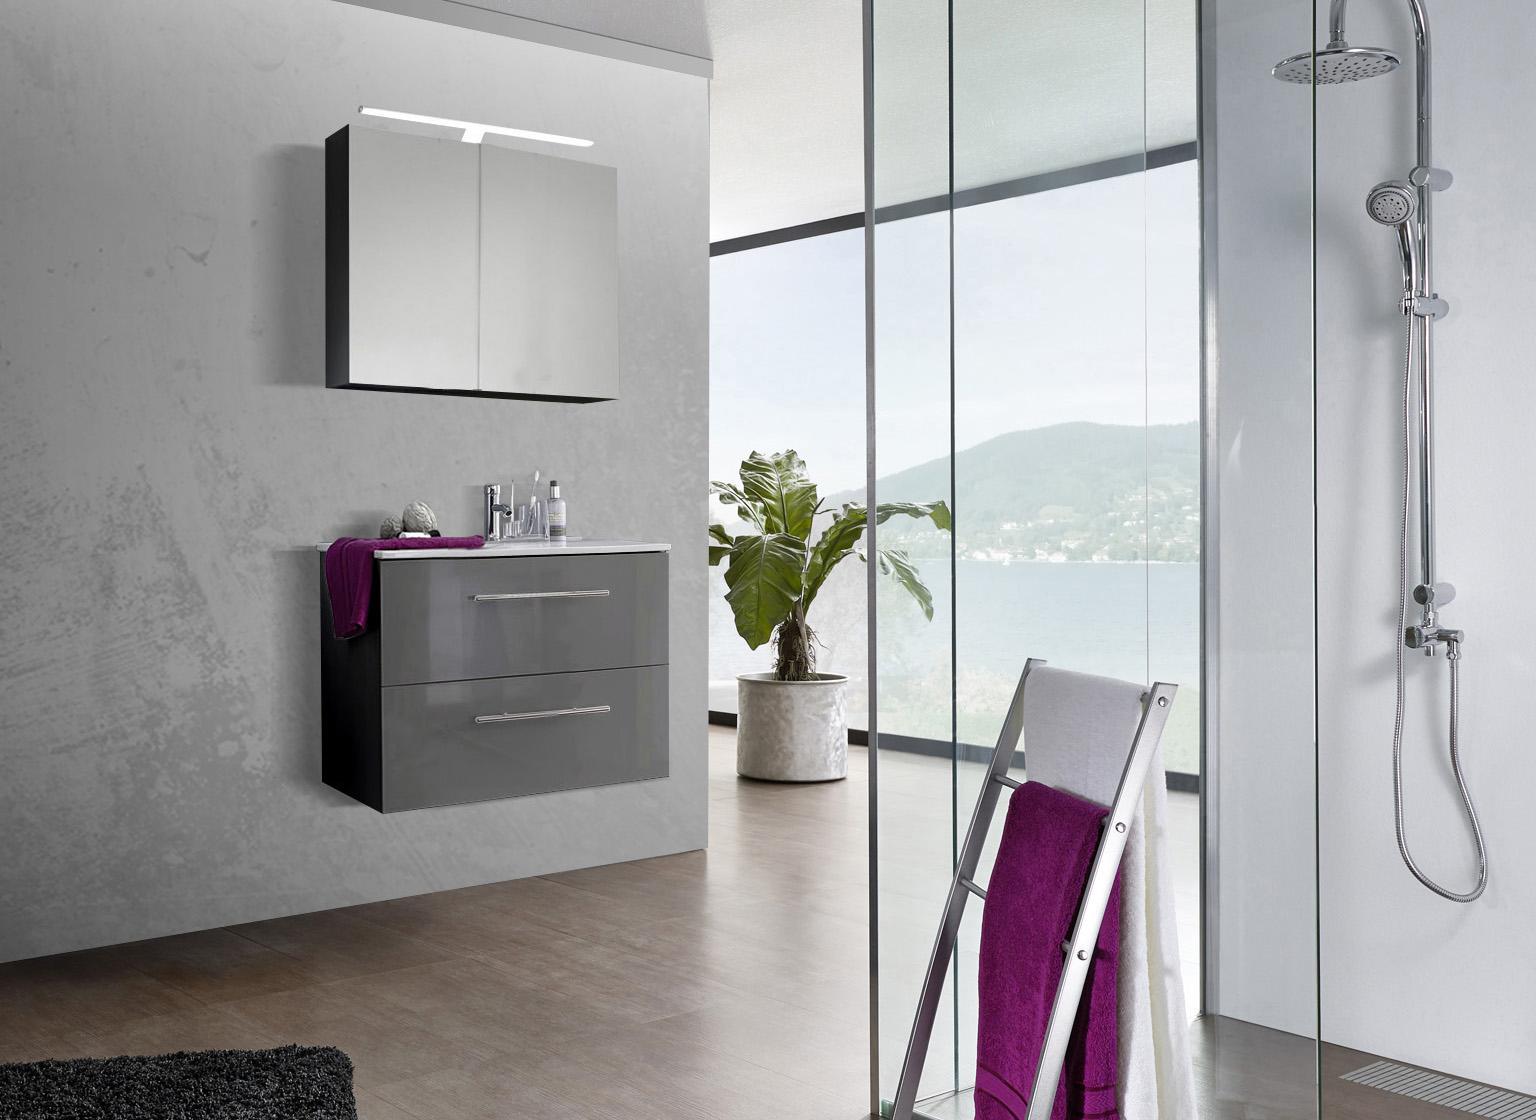 badezimmer 80 cm | vitaplaza, Badezimmer ideen